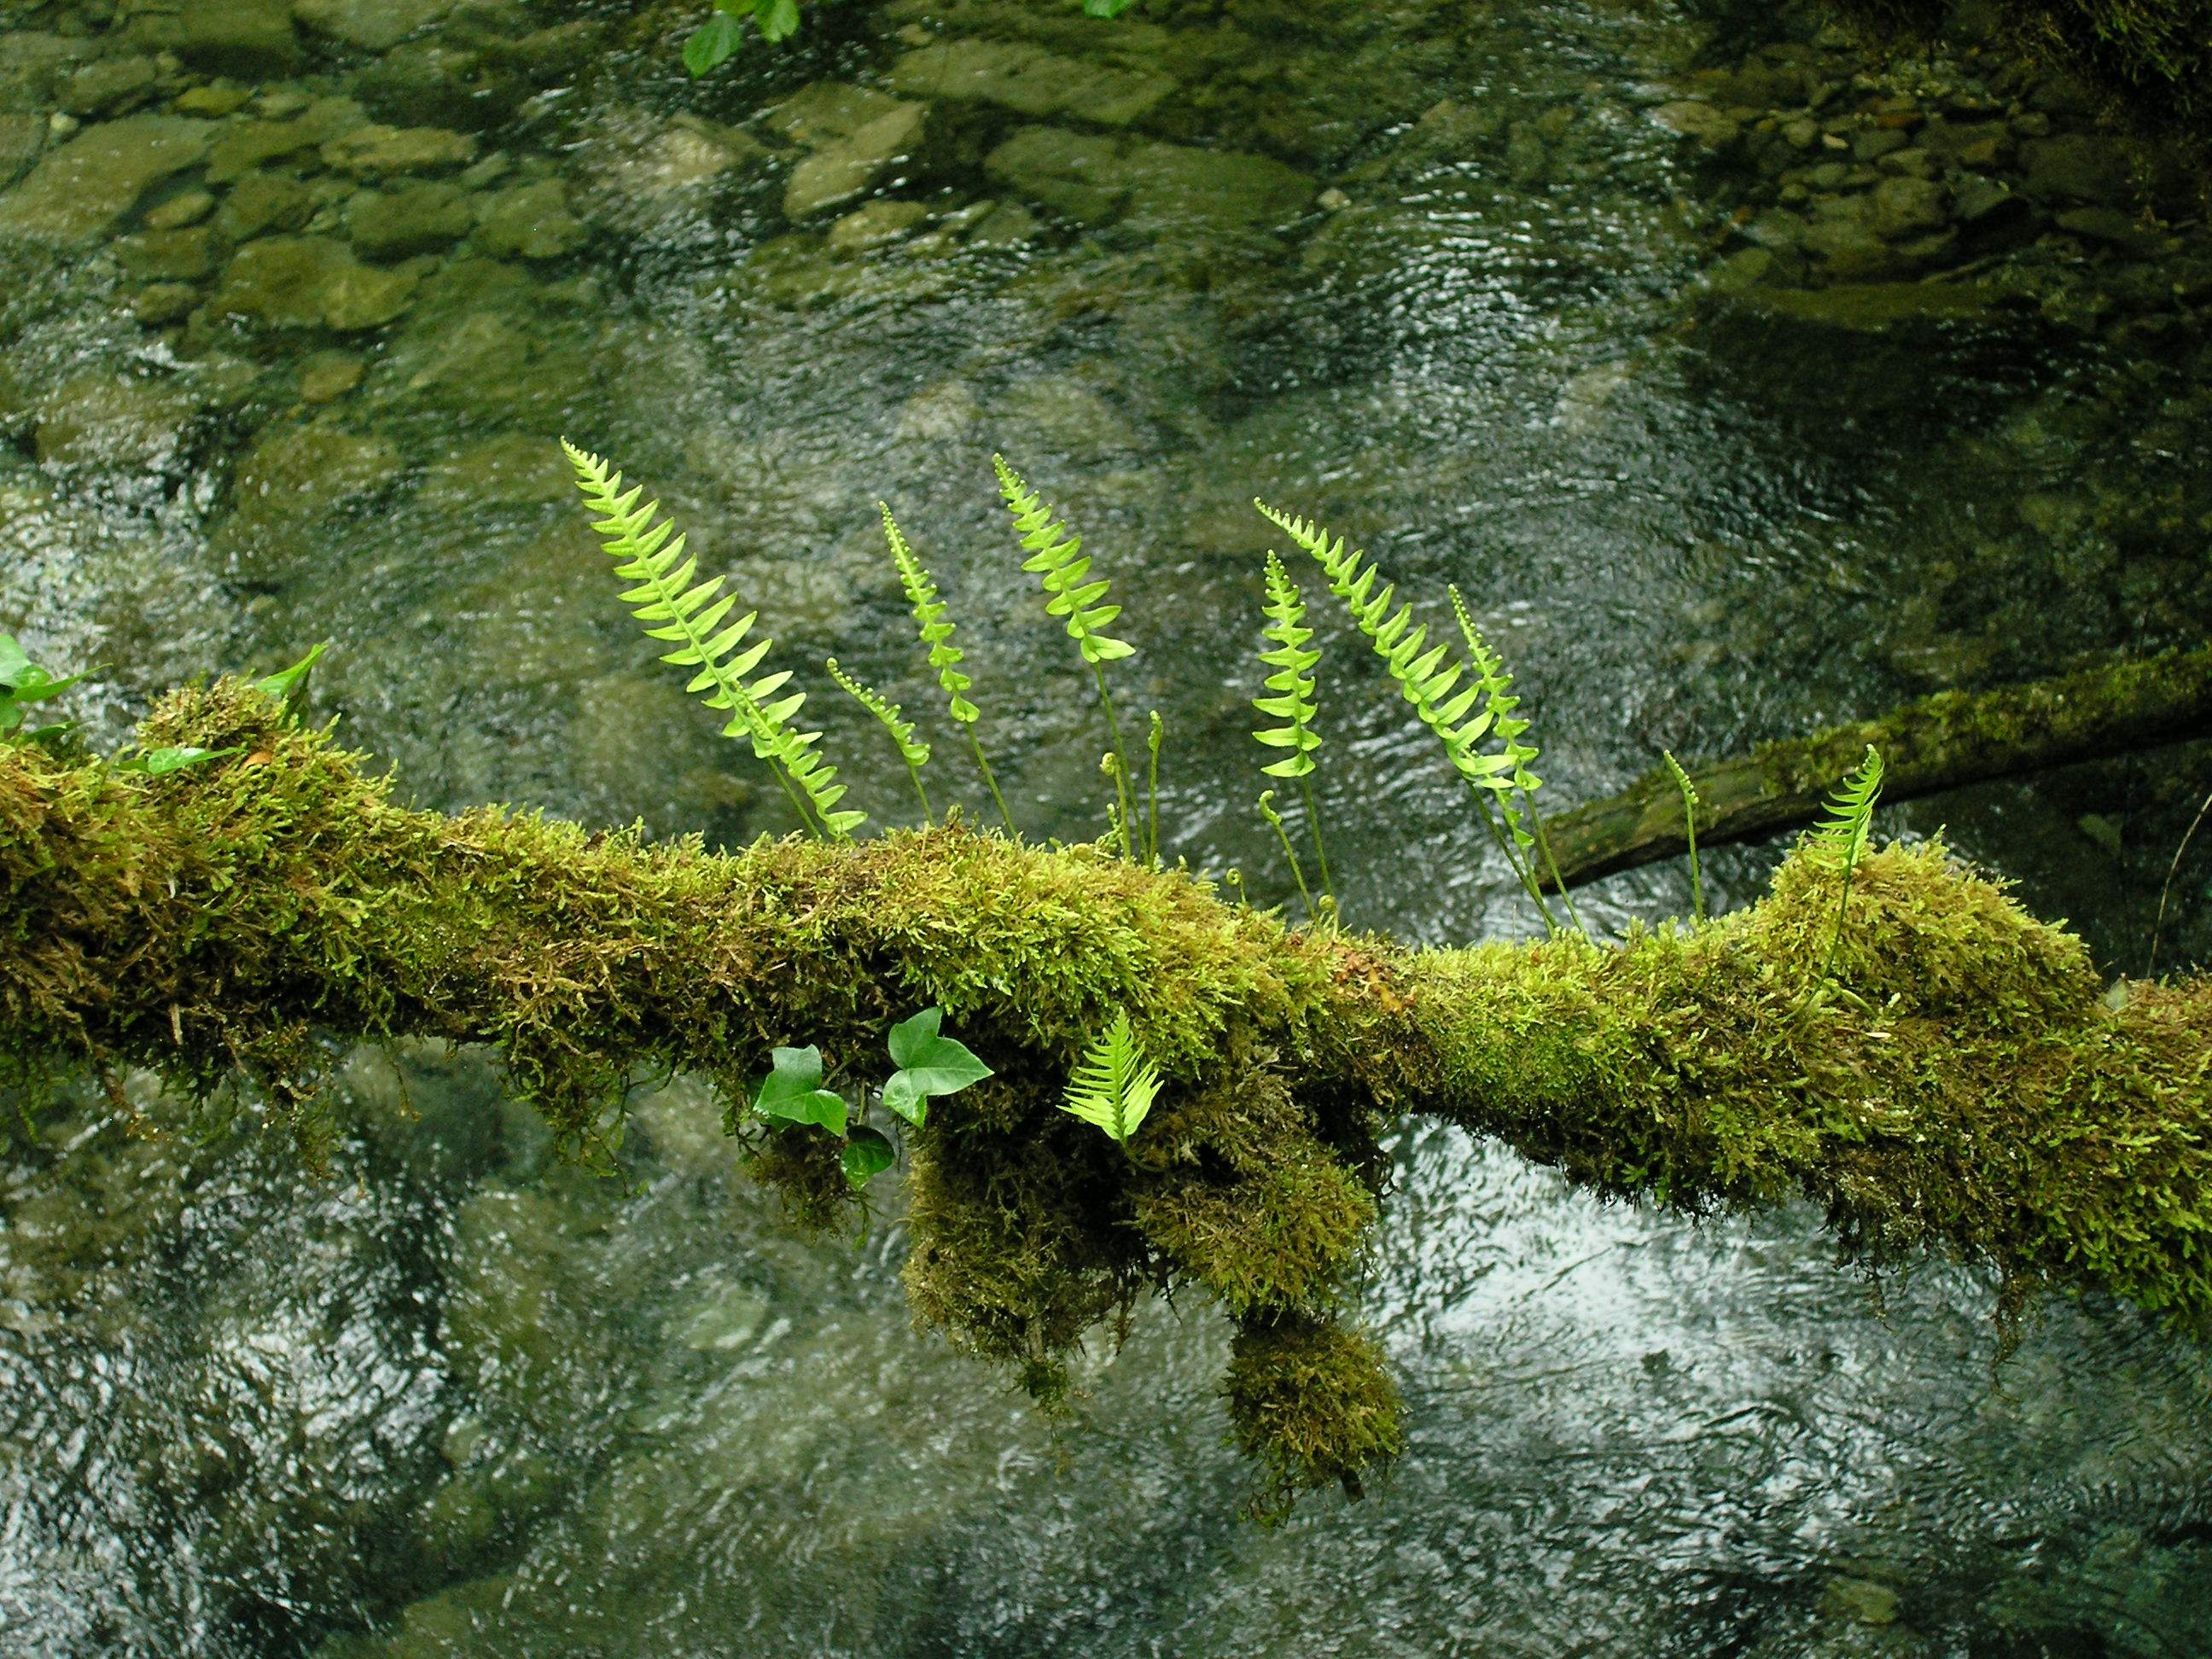 Polypodium vulgare épiphyte